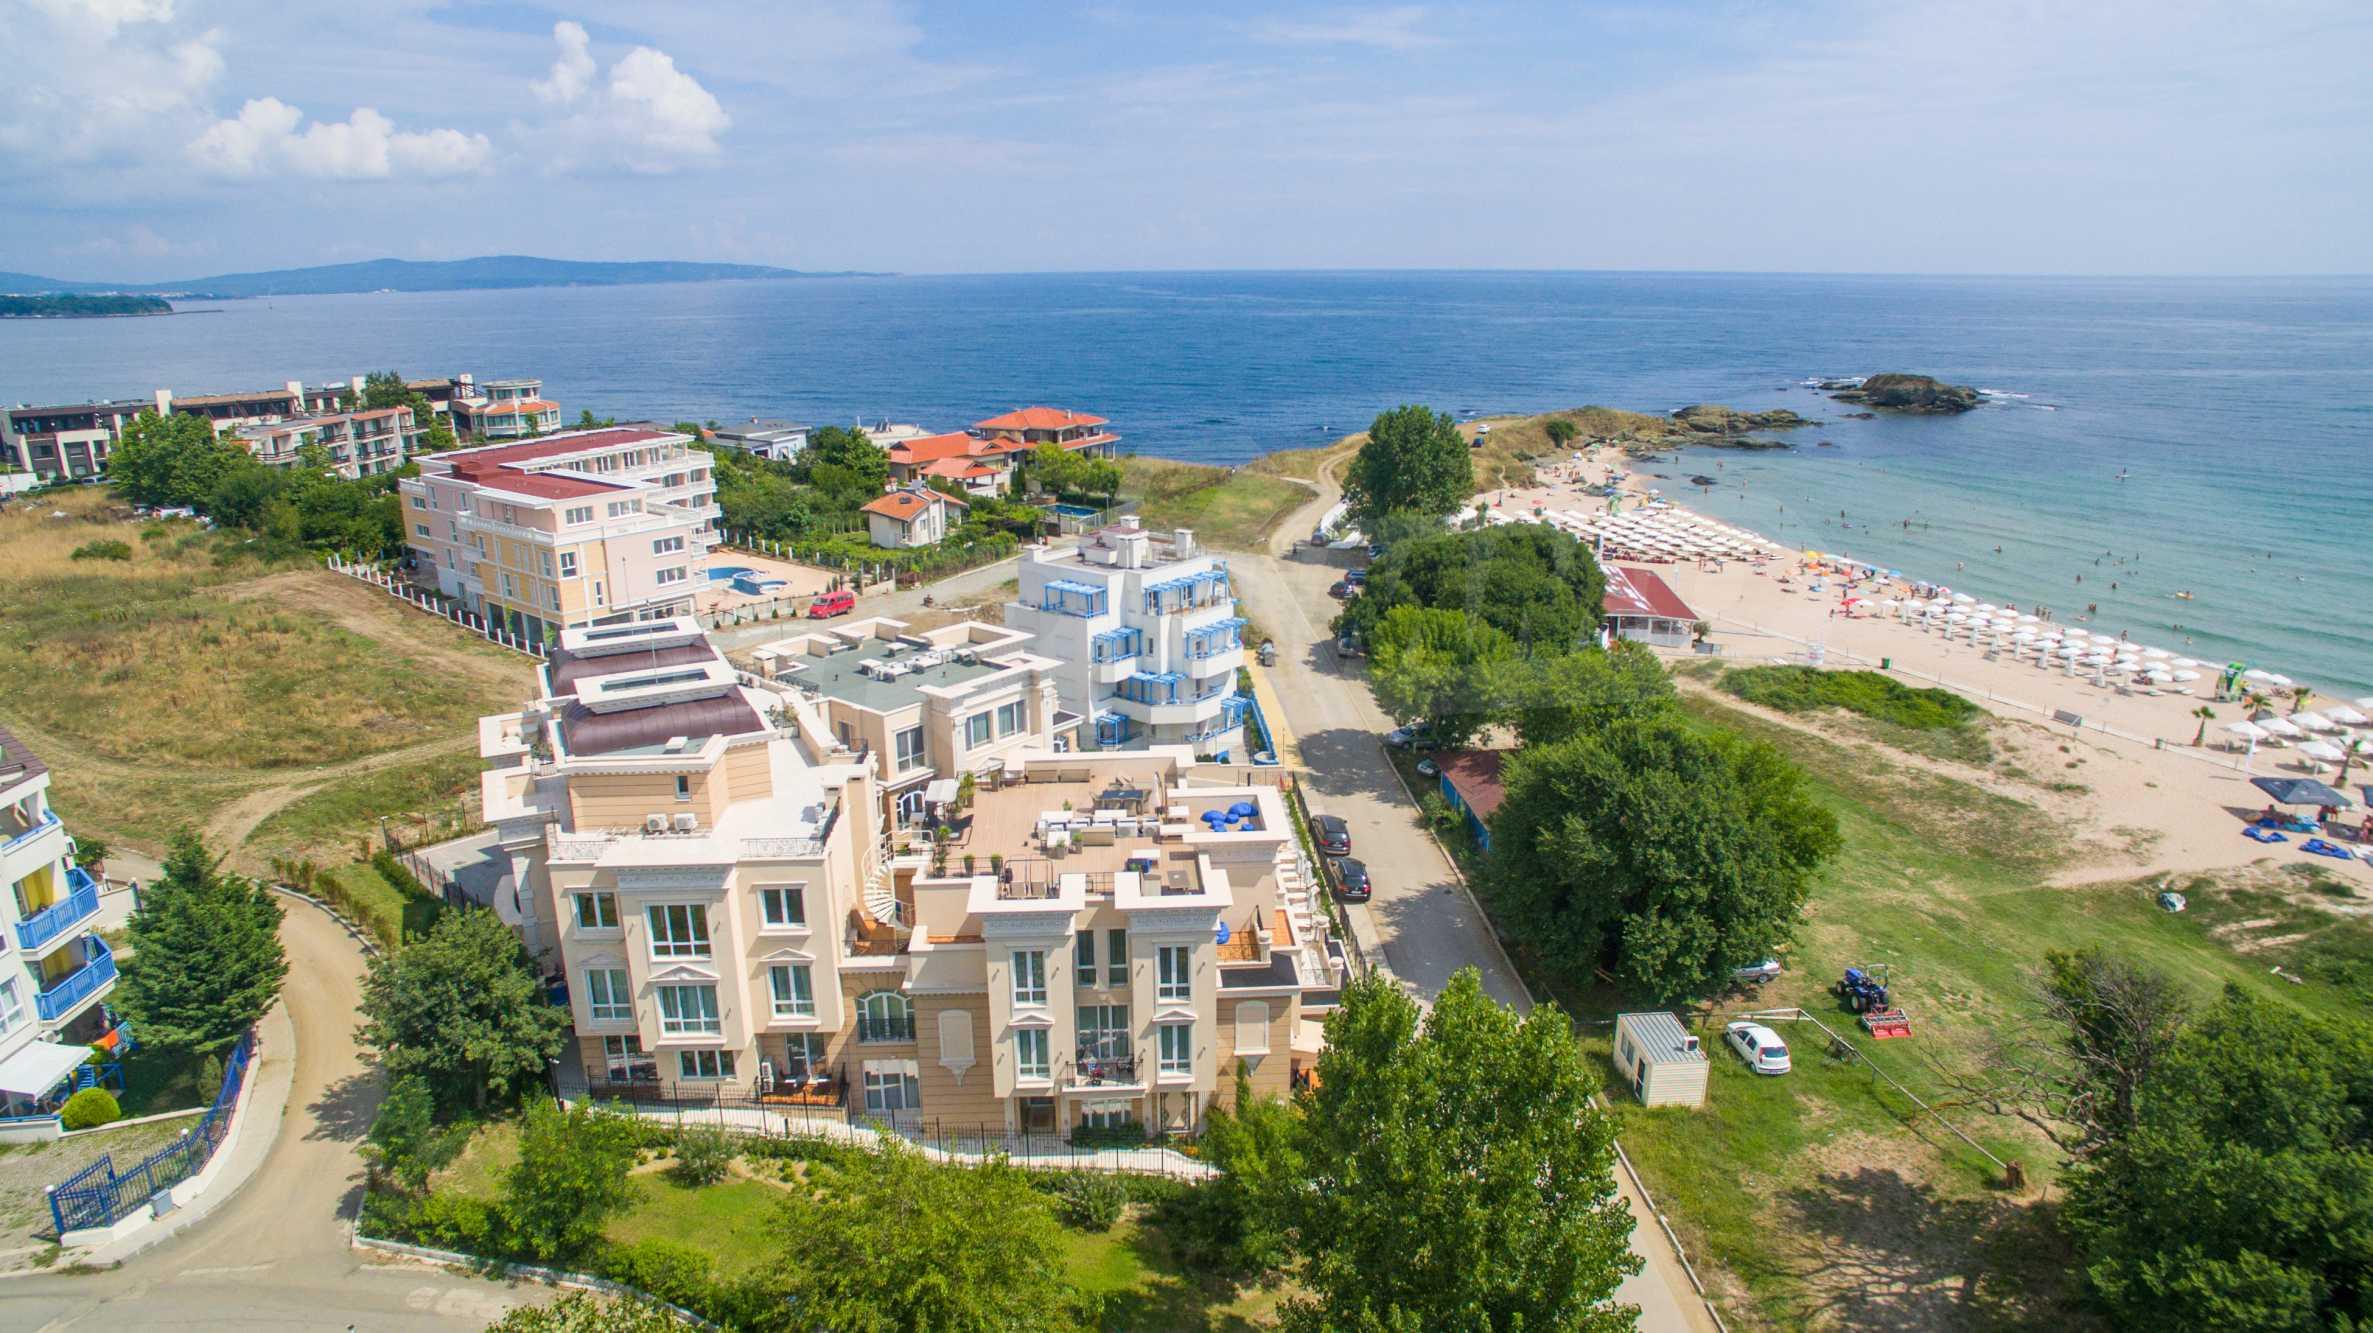 Exclusive 2-bedroom beachfront apartment in the prestigious Belle Époque Beach Residence 51